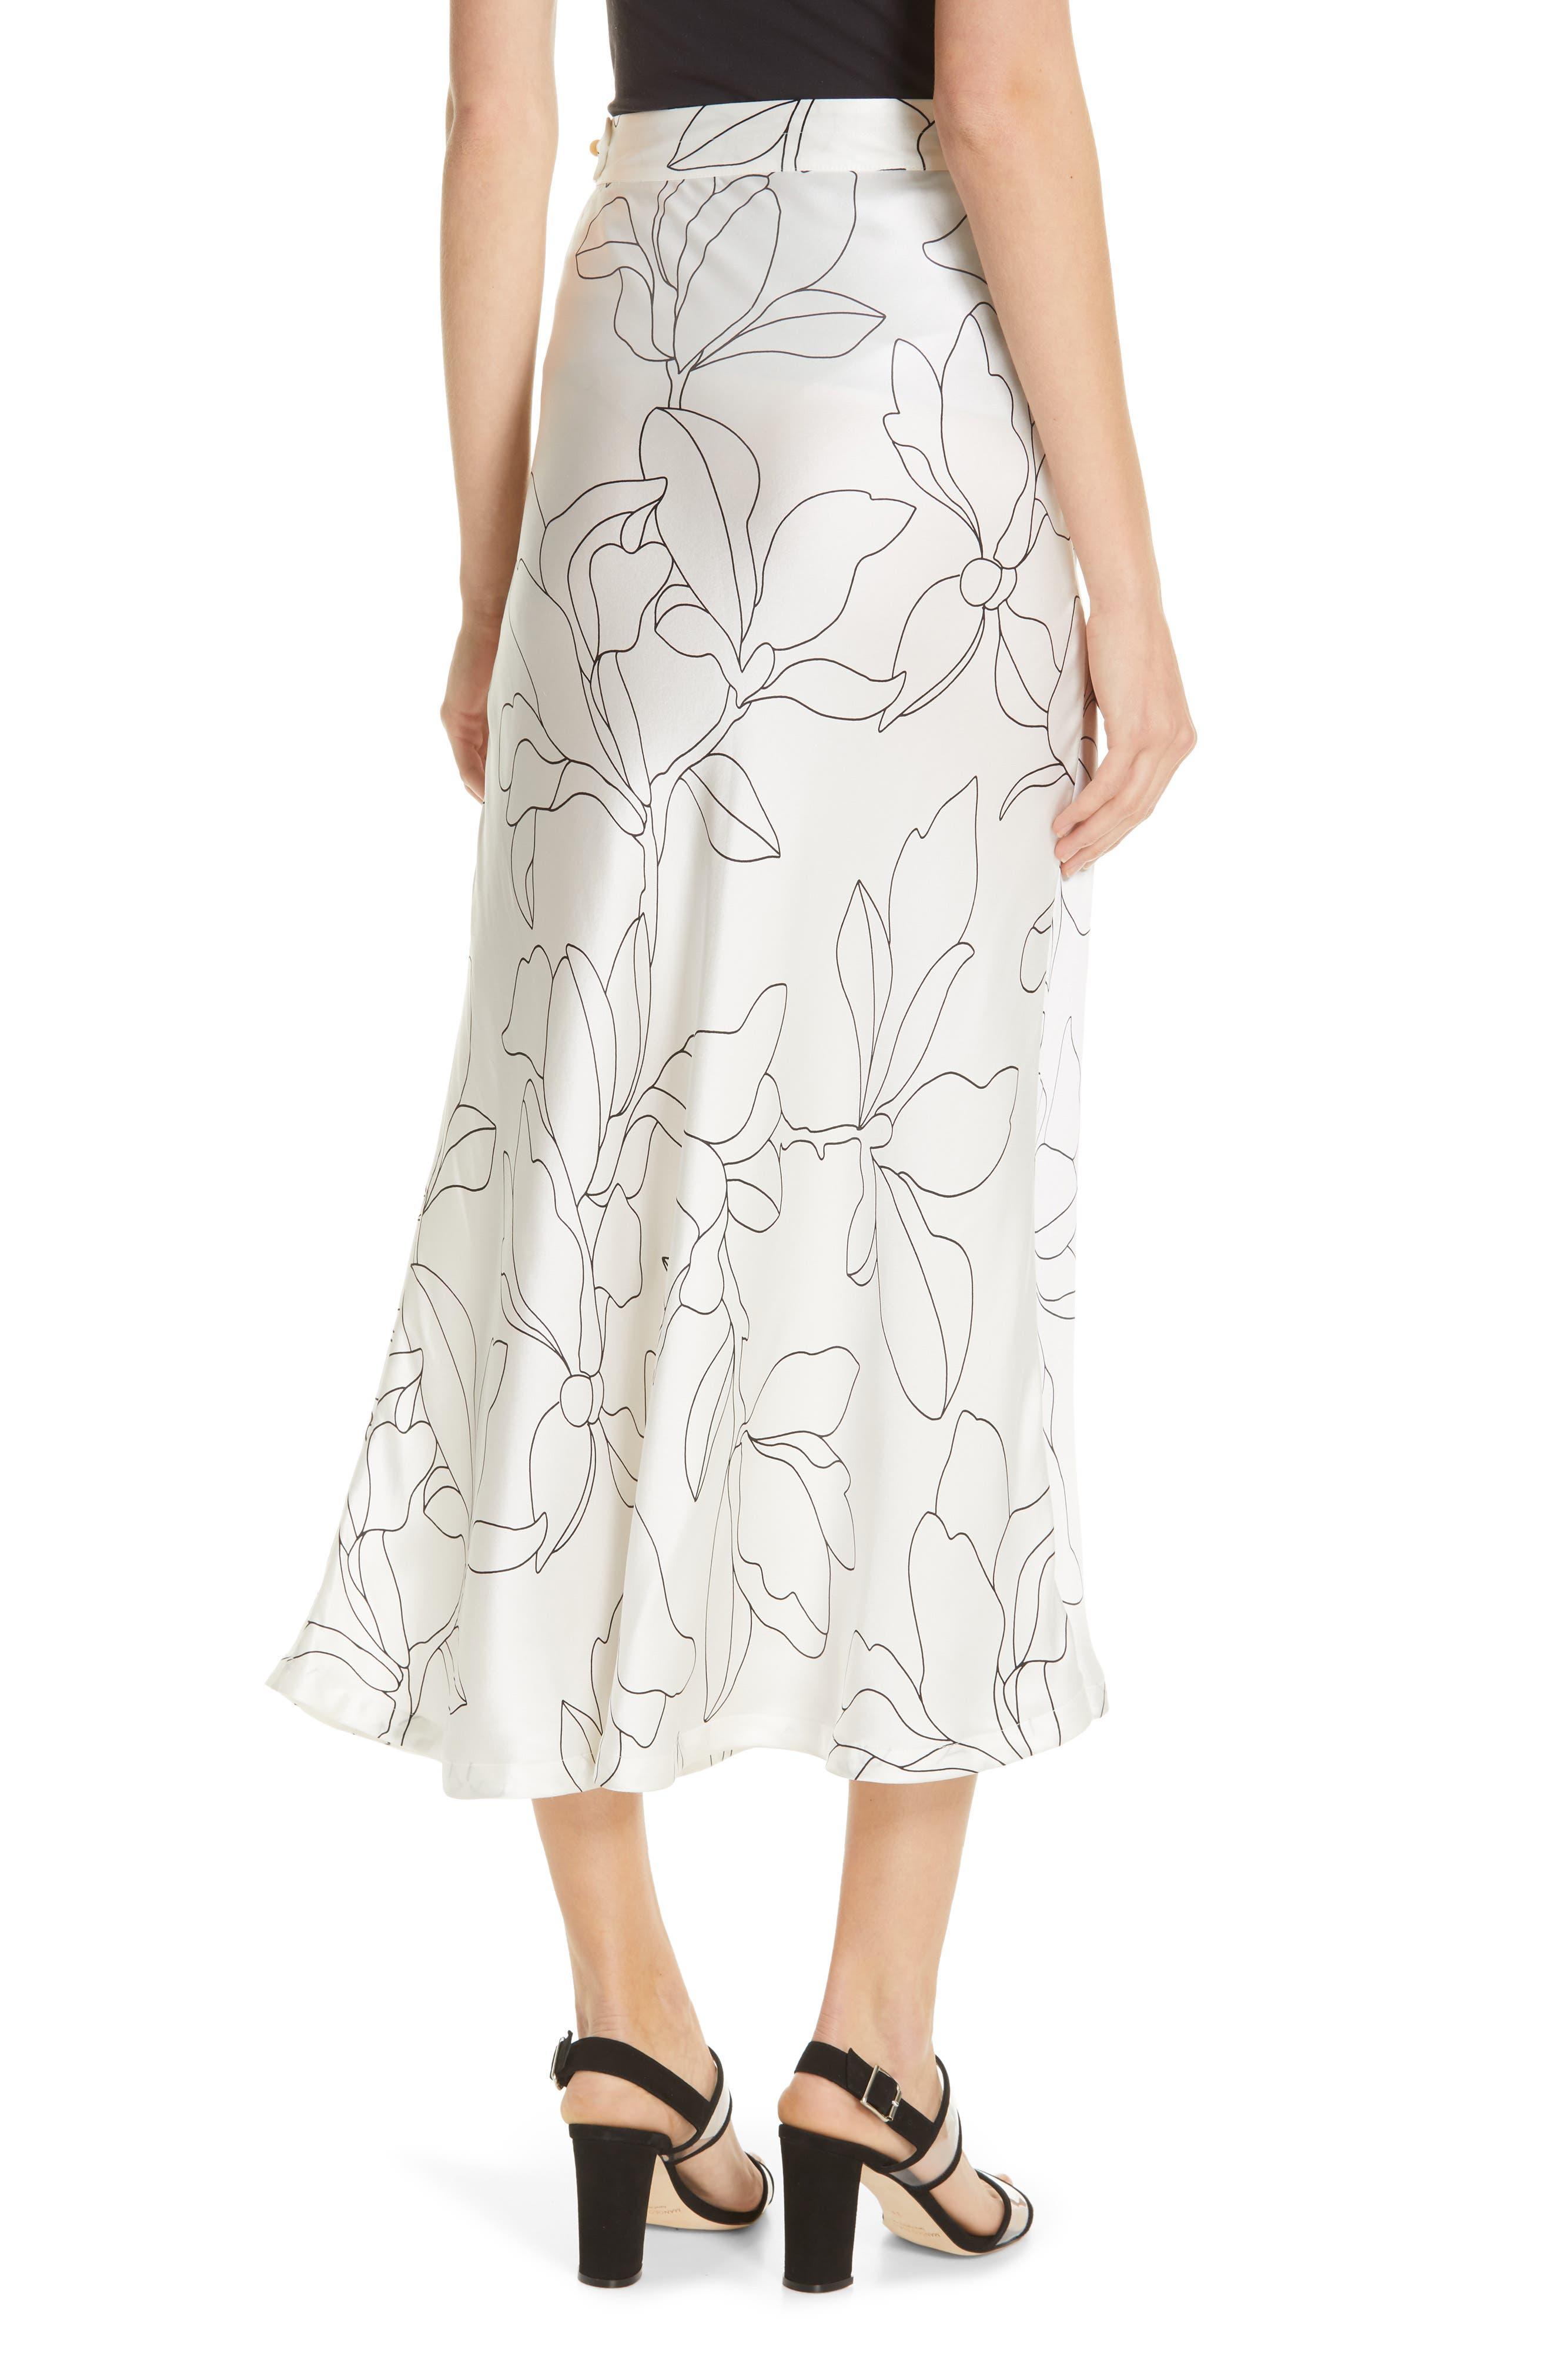 Iva Floral Silk Midi Skirt,                             Alternate thumbnail 2, color,                             NATURAL WHITE TRUE BLACK